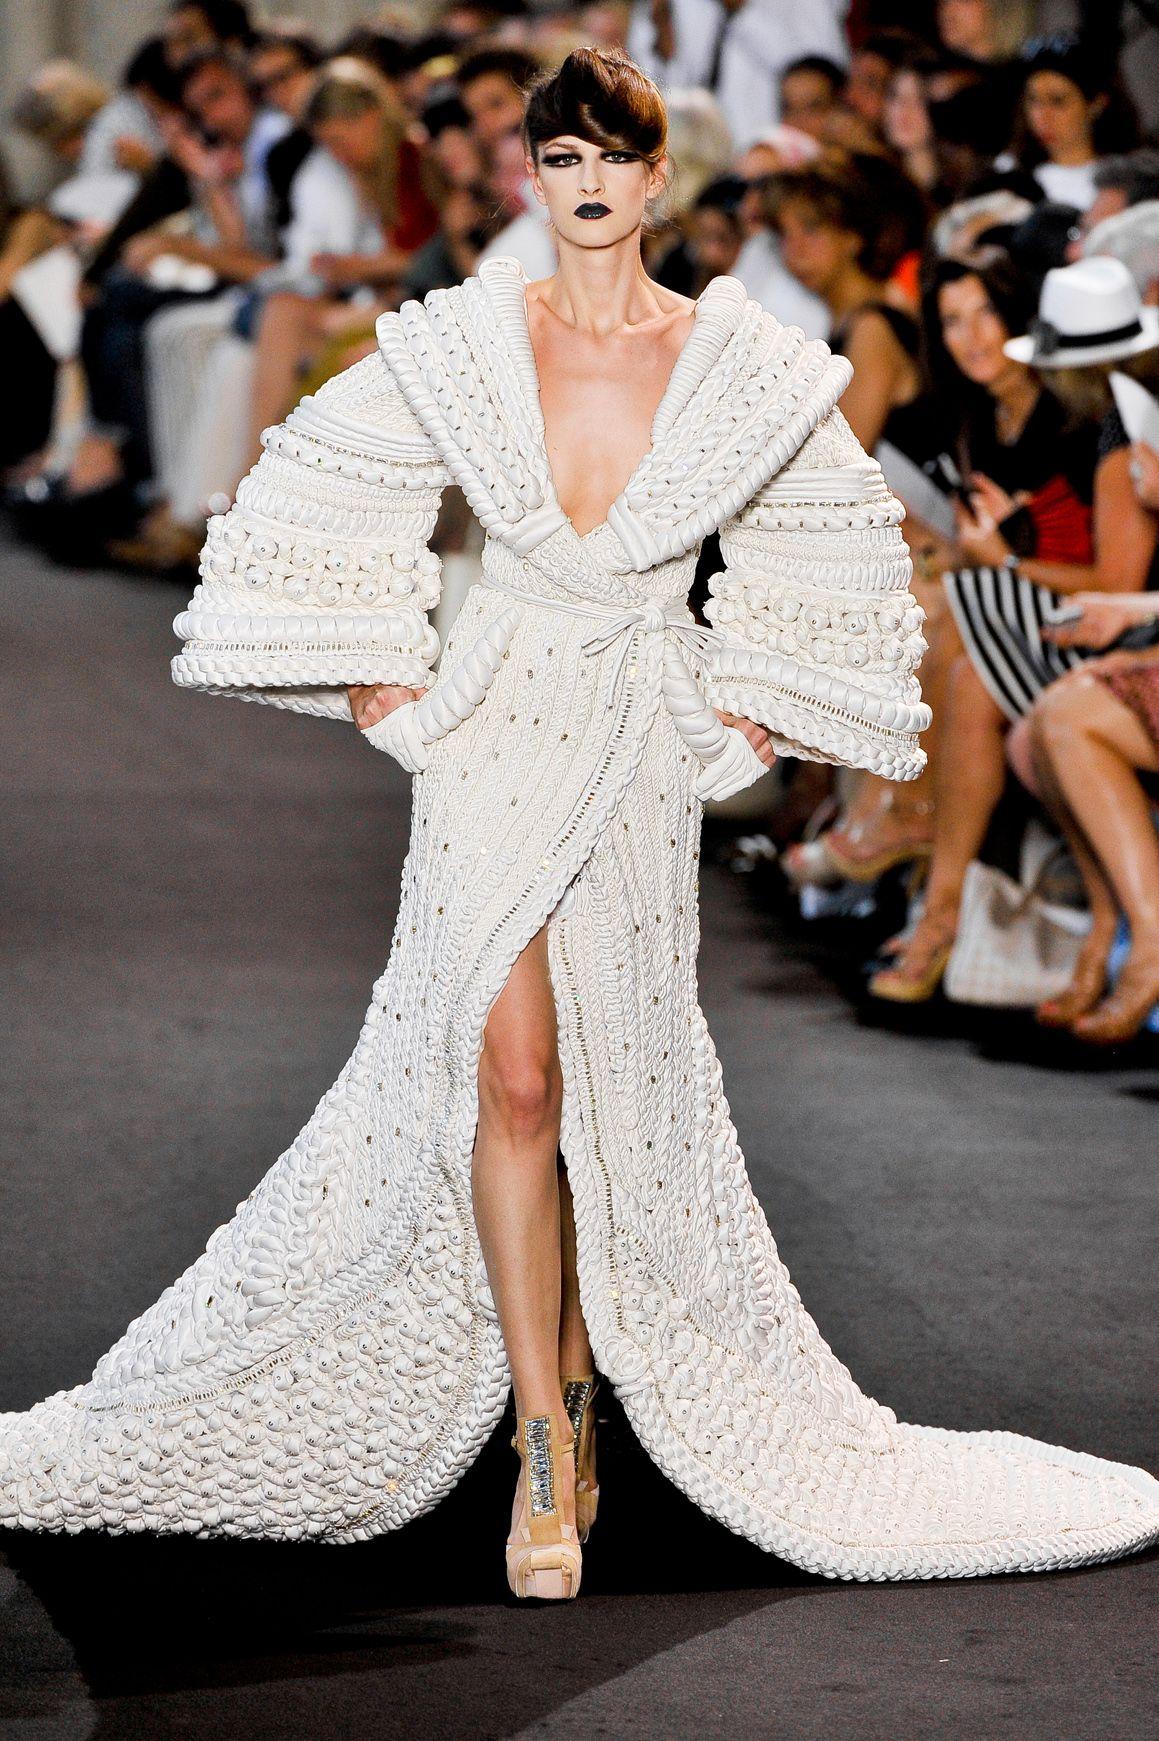 Robe Haute Couture Automne Hiver 2011 2012 De Stephane Rolland